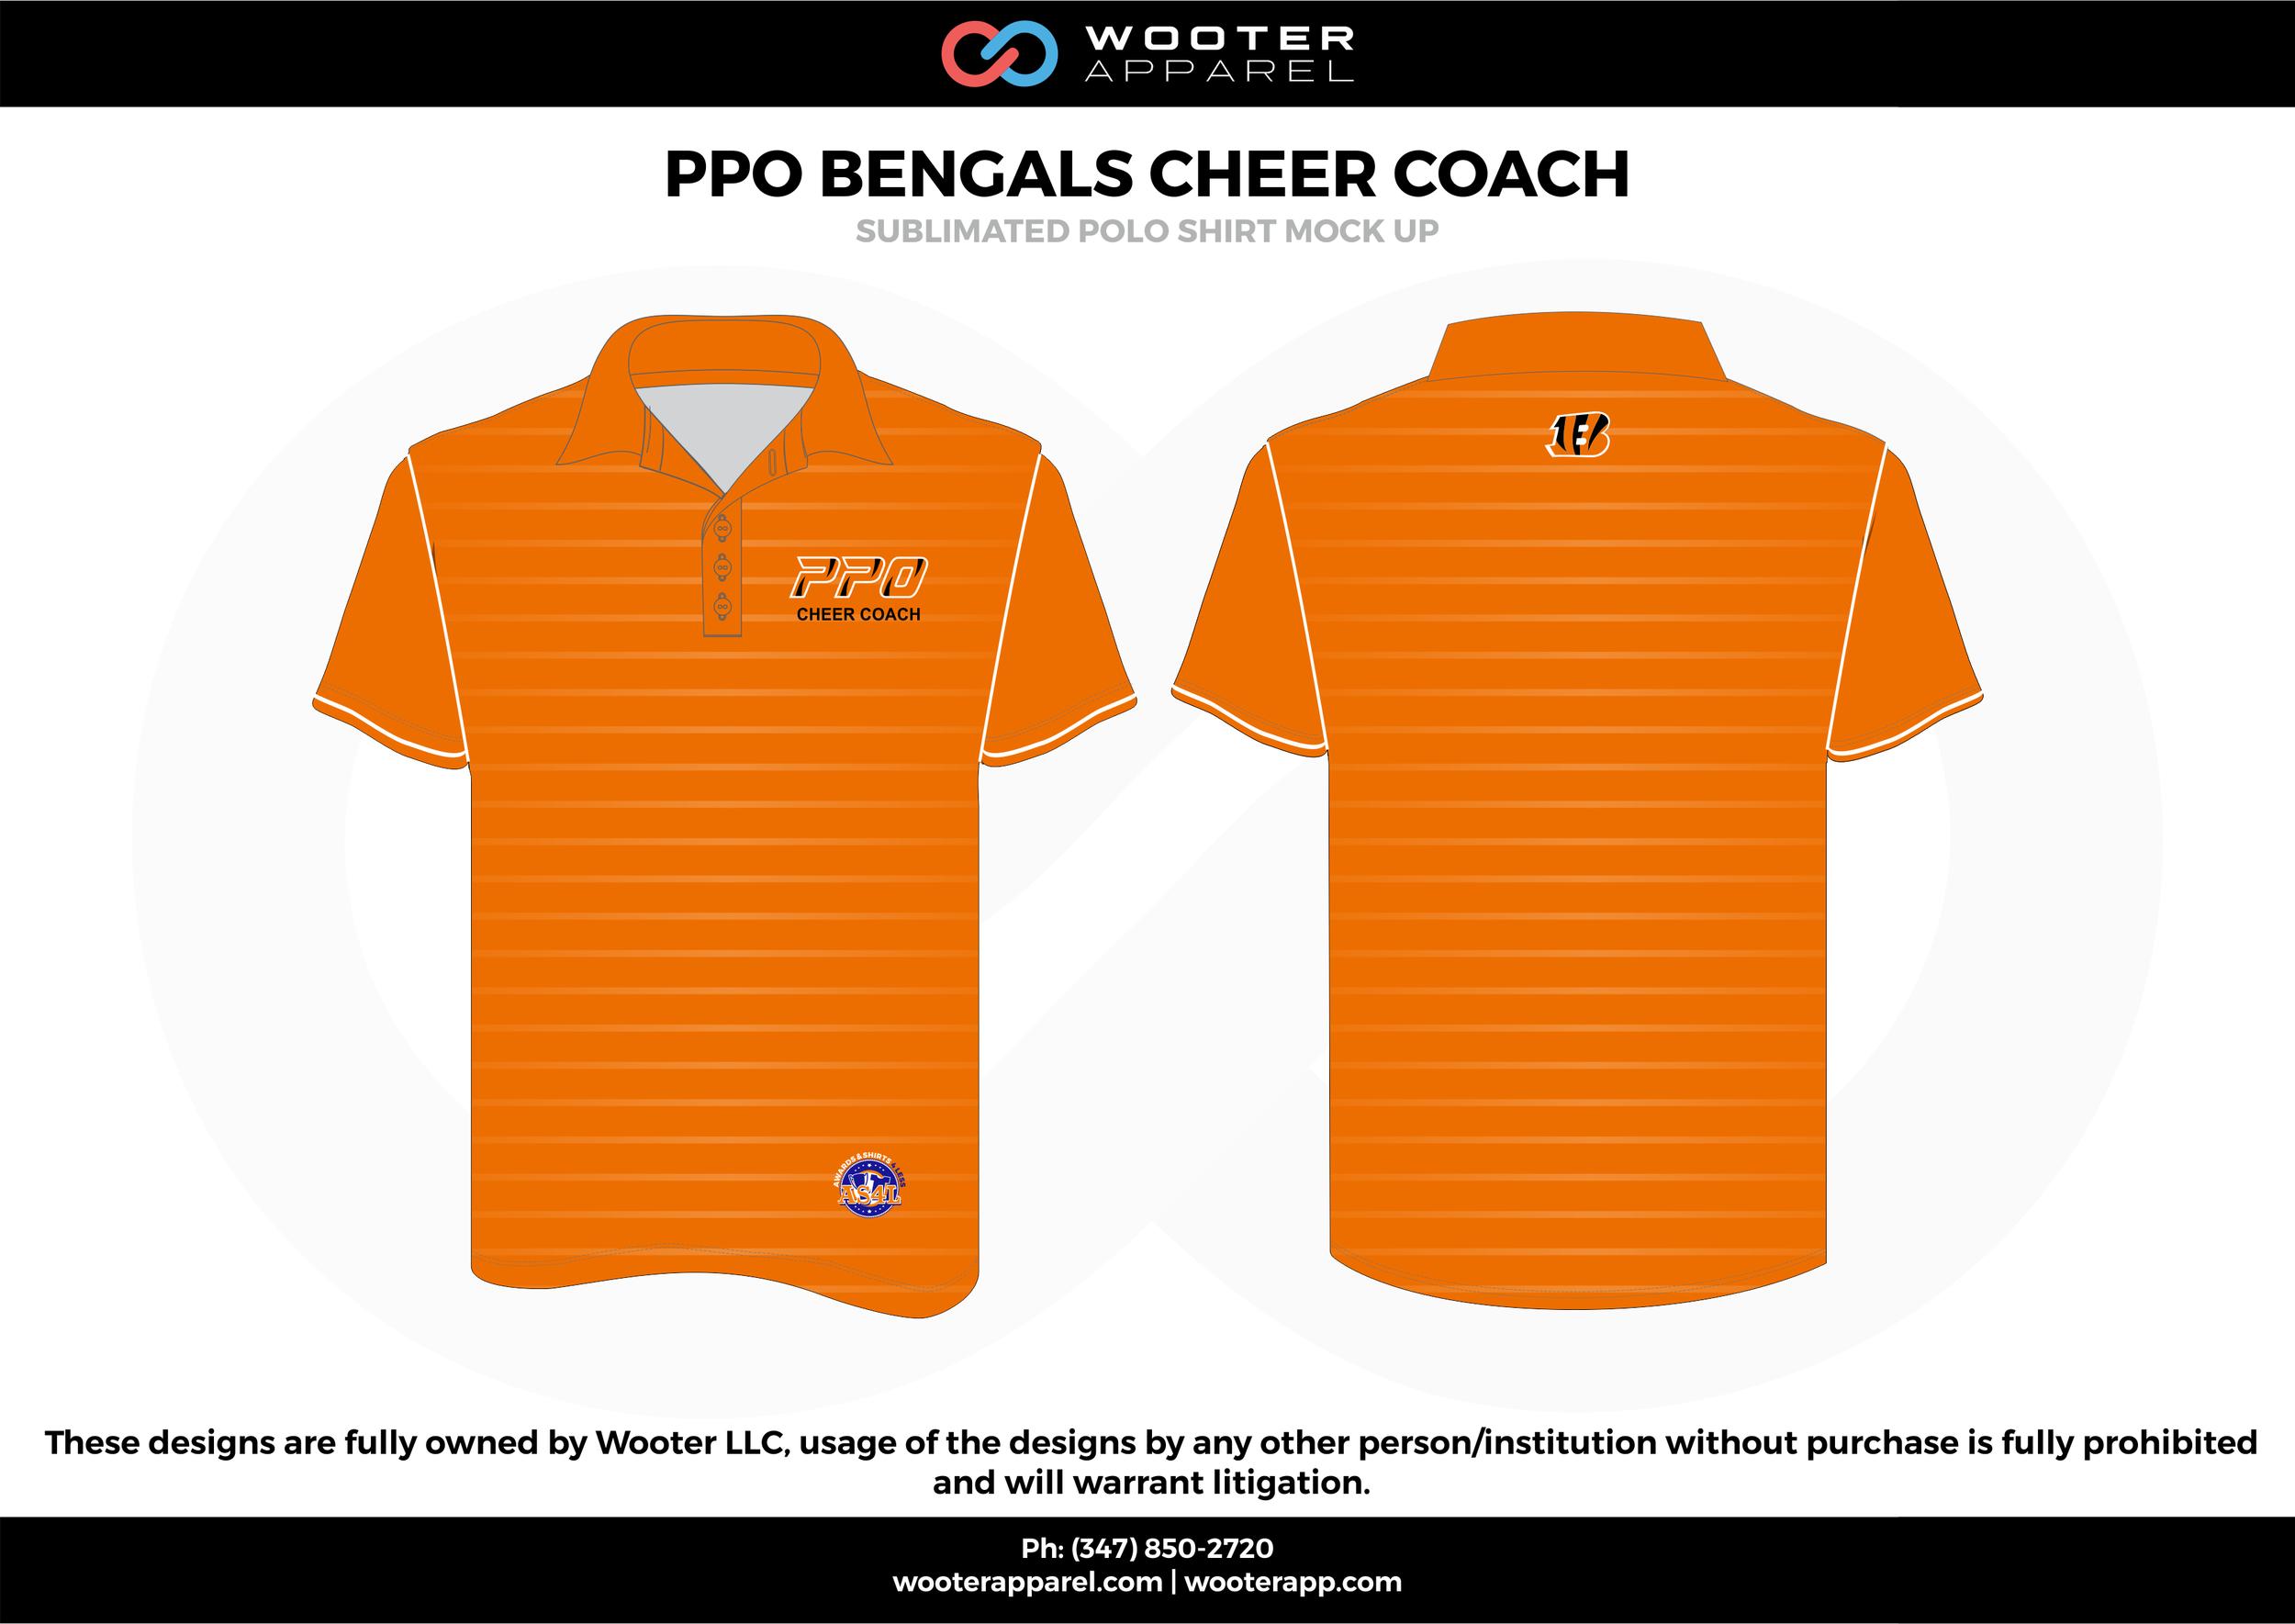 PPO BENGALS CHEER COACH orange white black blue Polo Shirts